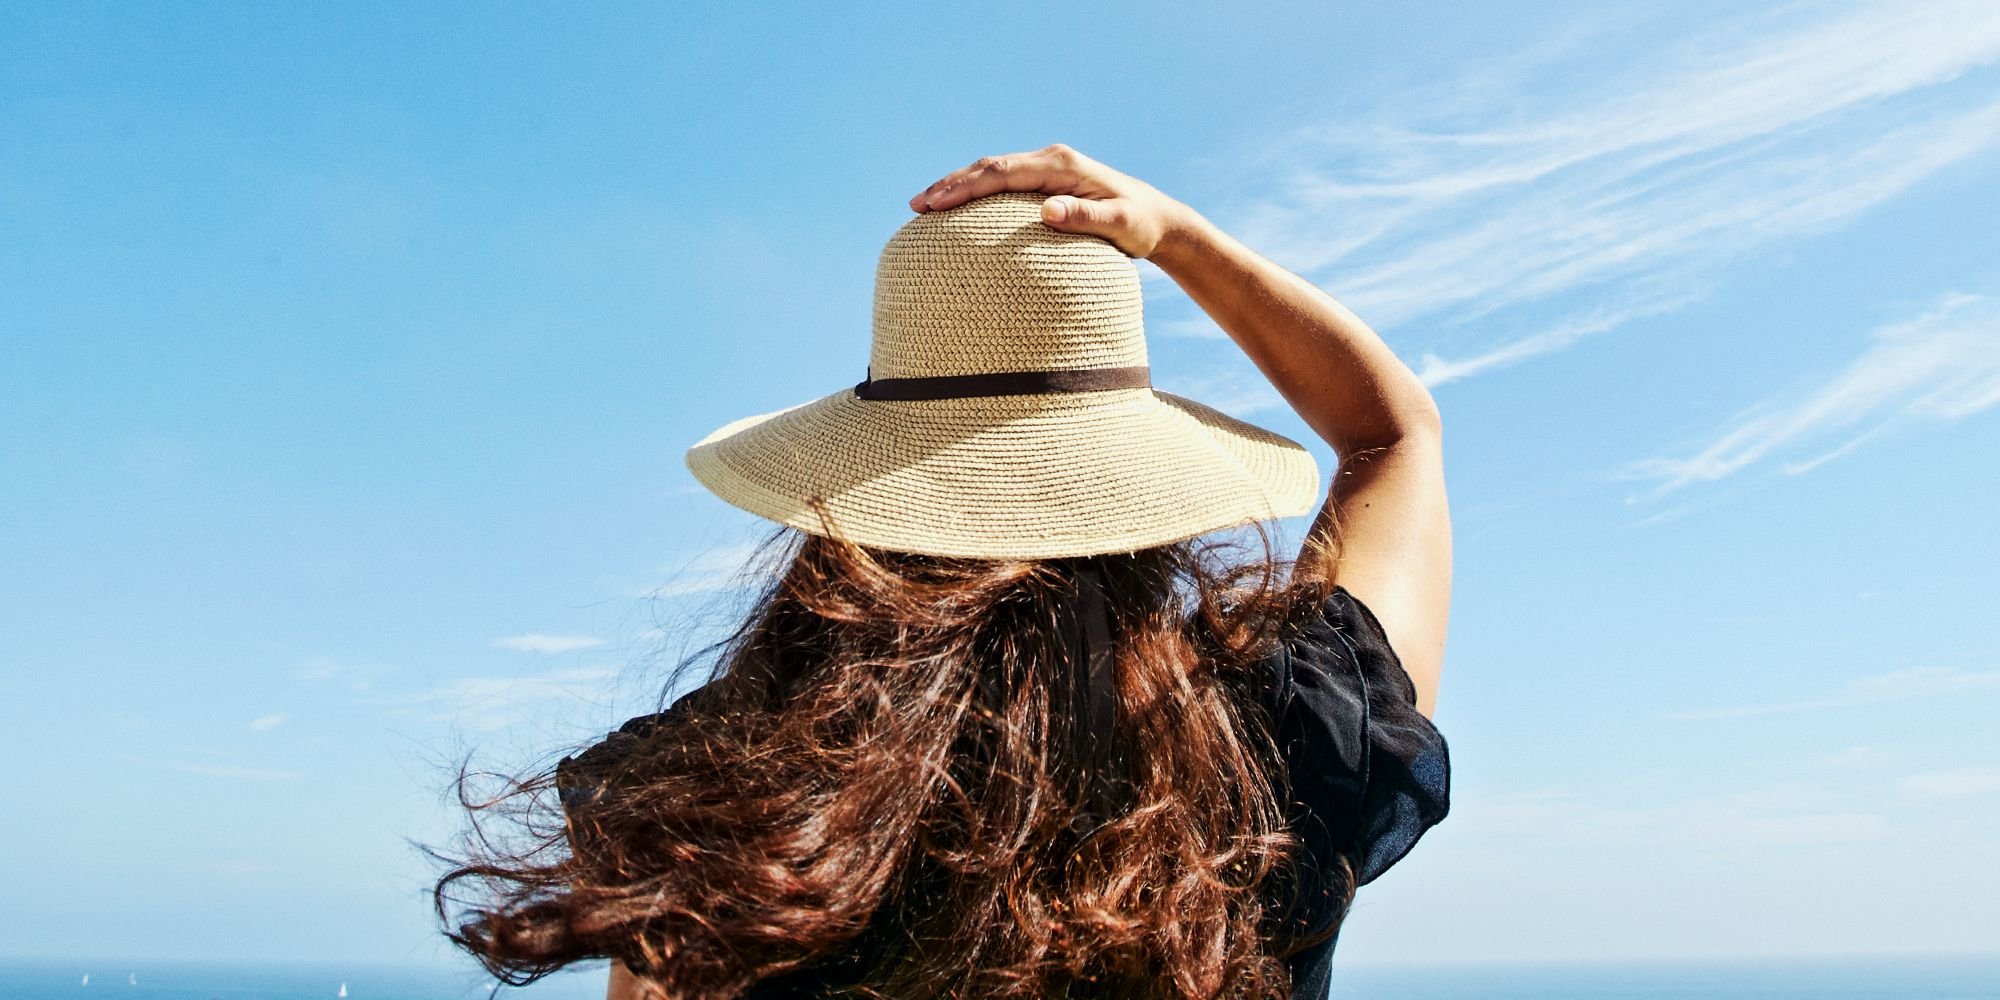 a513982d307 10 Cute Sun Hats for Women in 2018 - Straw Beach Hats for Summer